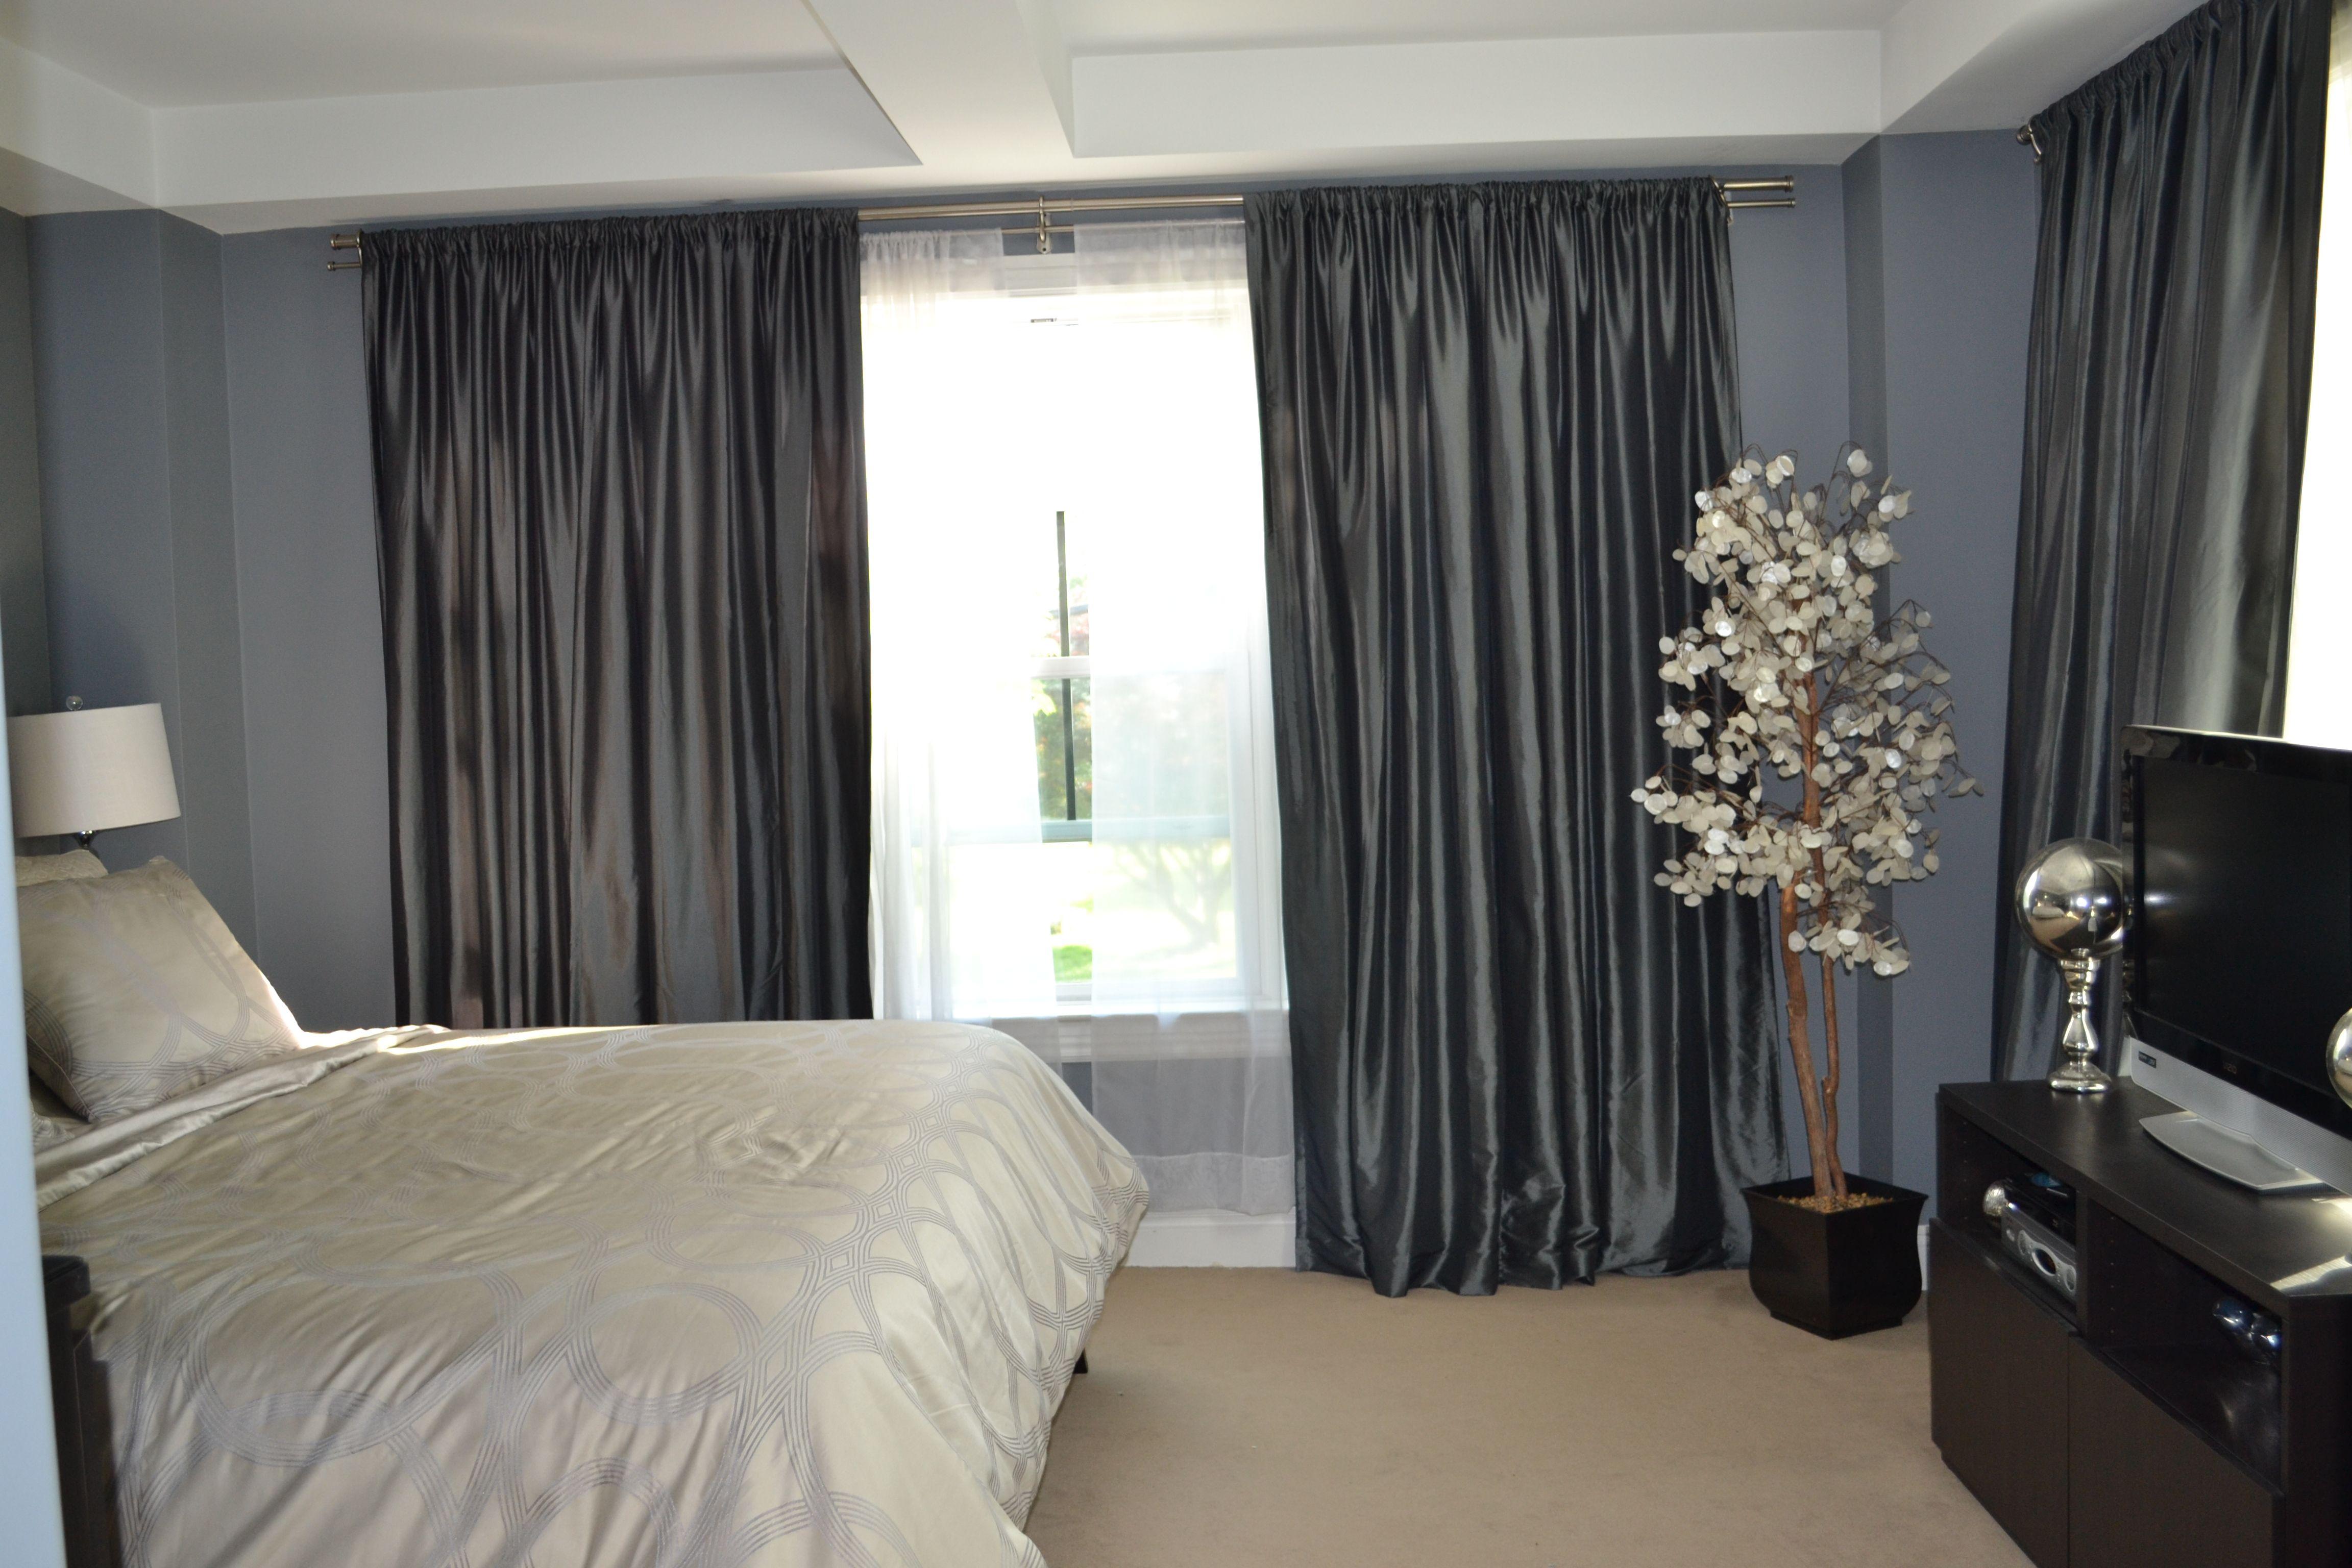 Benjamin moore aura deep silver bedroom apartment decor - Benjamin moore aura interior paint ...